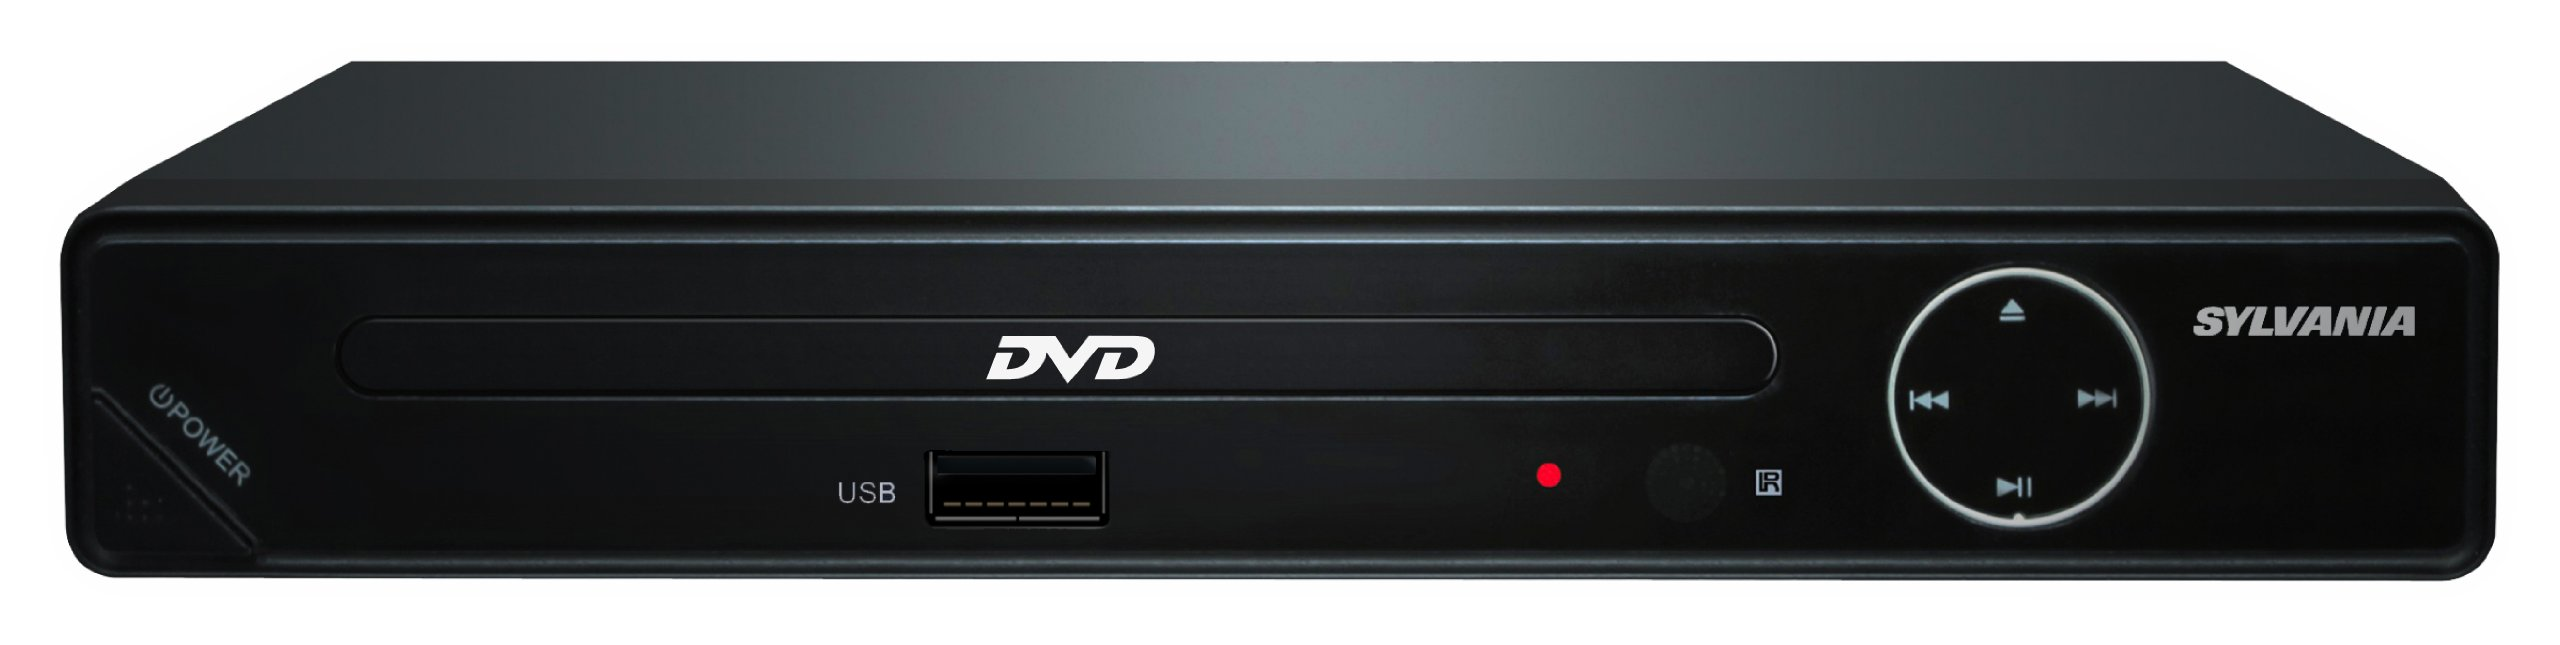 SDVD6670 Progressive Scan Compact HDMI DVD Player, 1080p Upconvert with USB Input by Sylvania